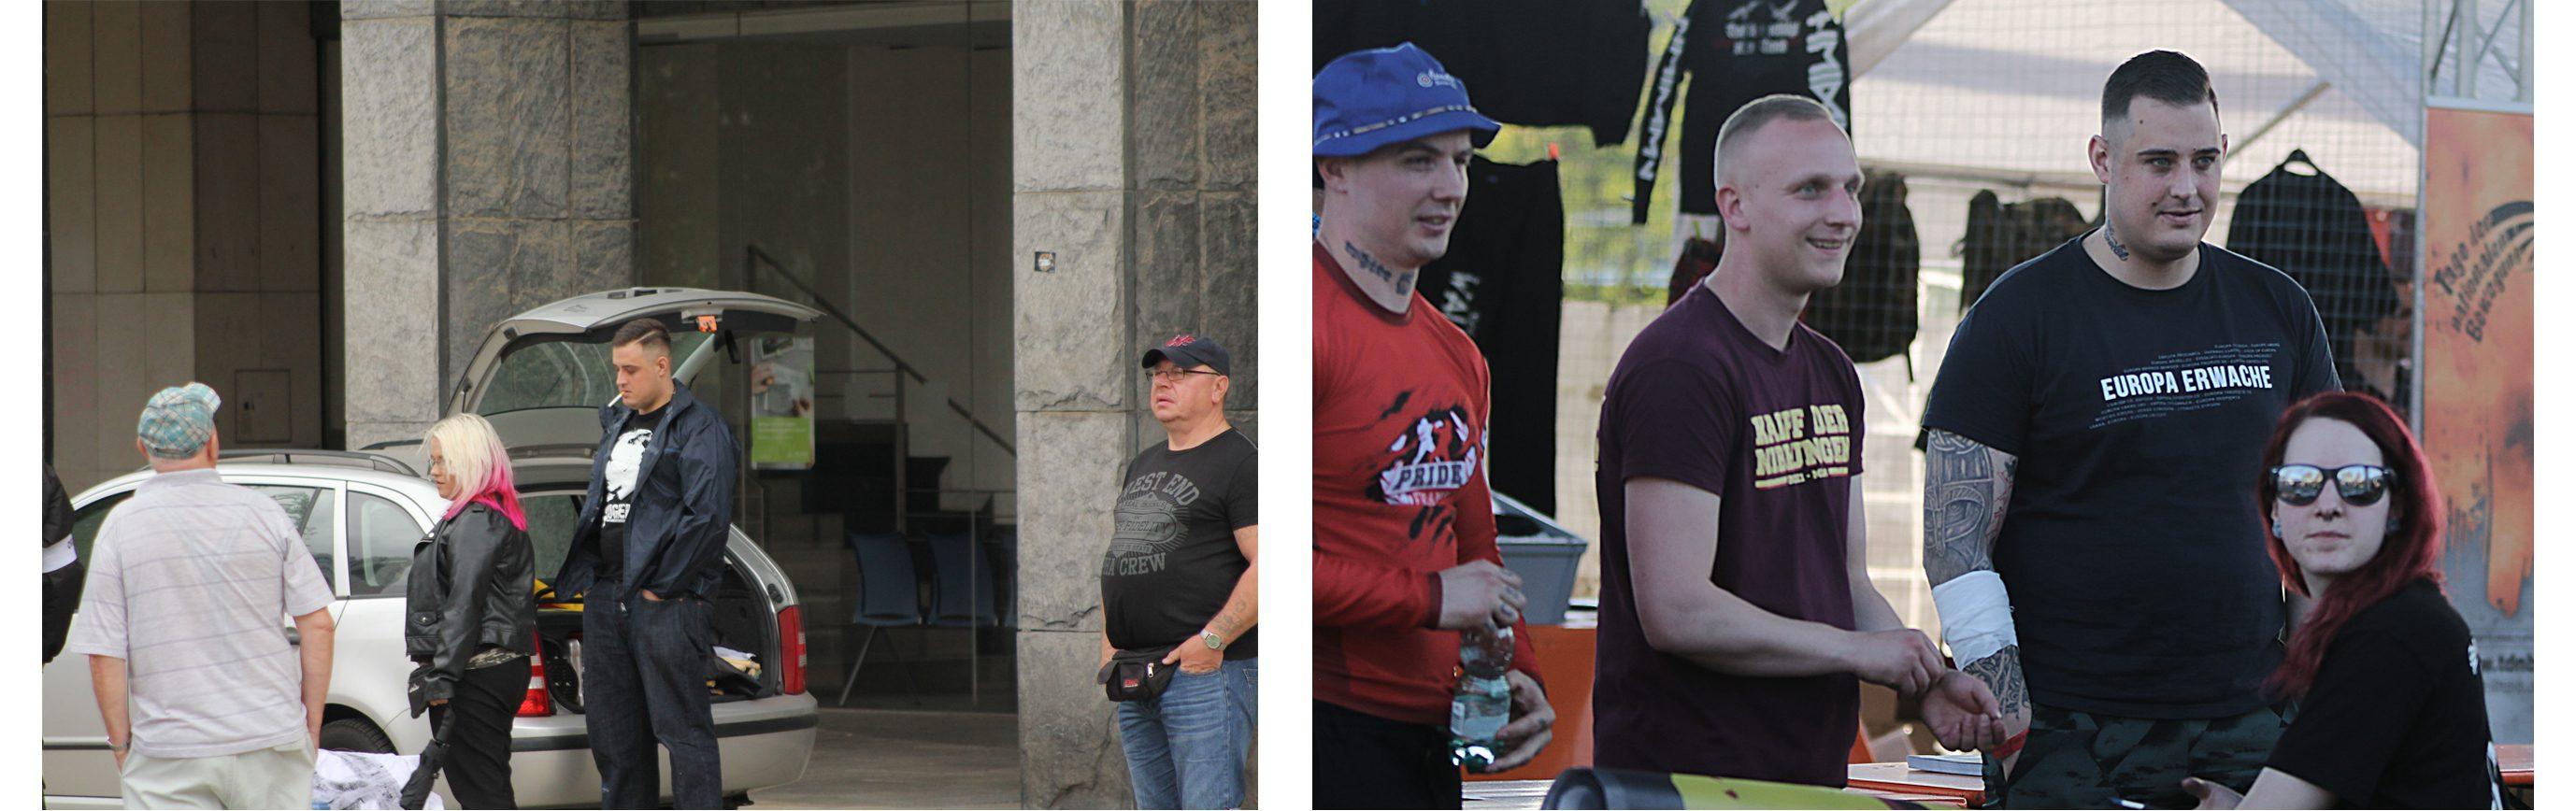 Linkes Bild: Tim Kühn am 21.09.2018 beim Aufmarsch von Pro Chemnitz Rechtes Bild: v.l.n.r. Tomasz Skatulsky (Frankreich), Jim Koal (Dortmund, Ex-Chemnitz), Tim Kühn (Chemnitz), Marina Liszczewski (Dortmund)